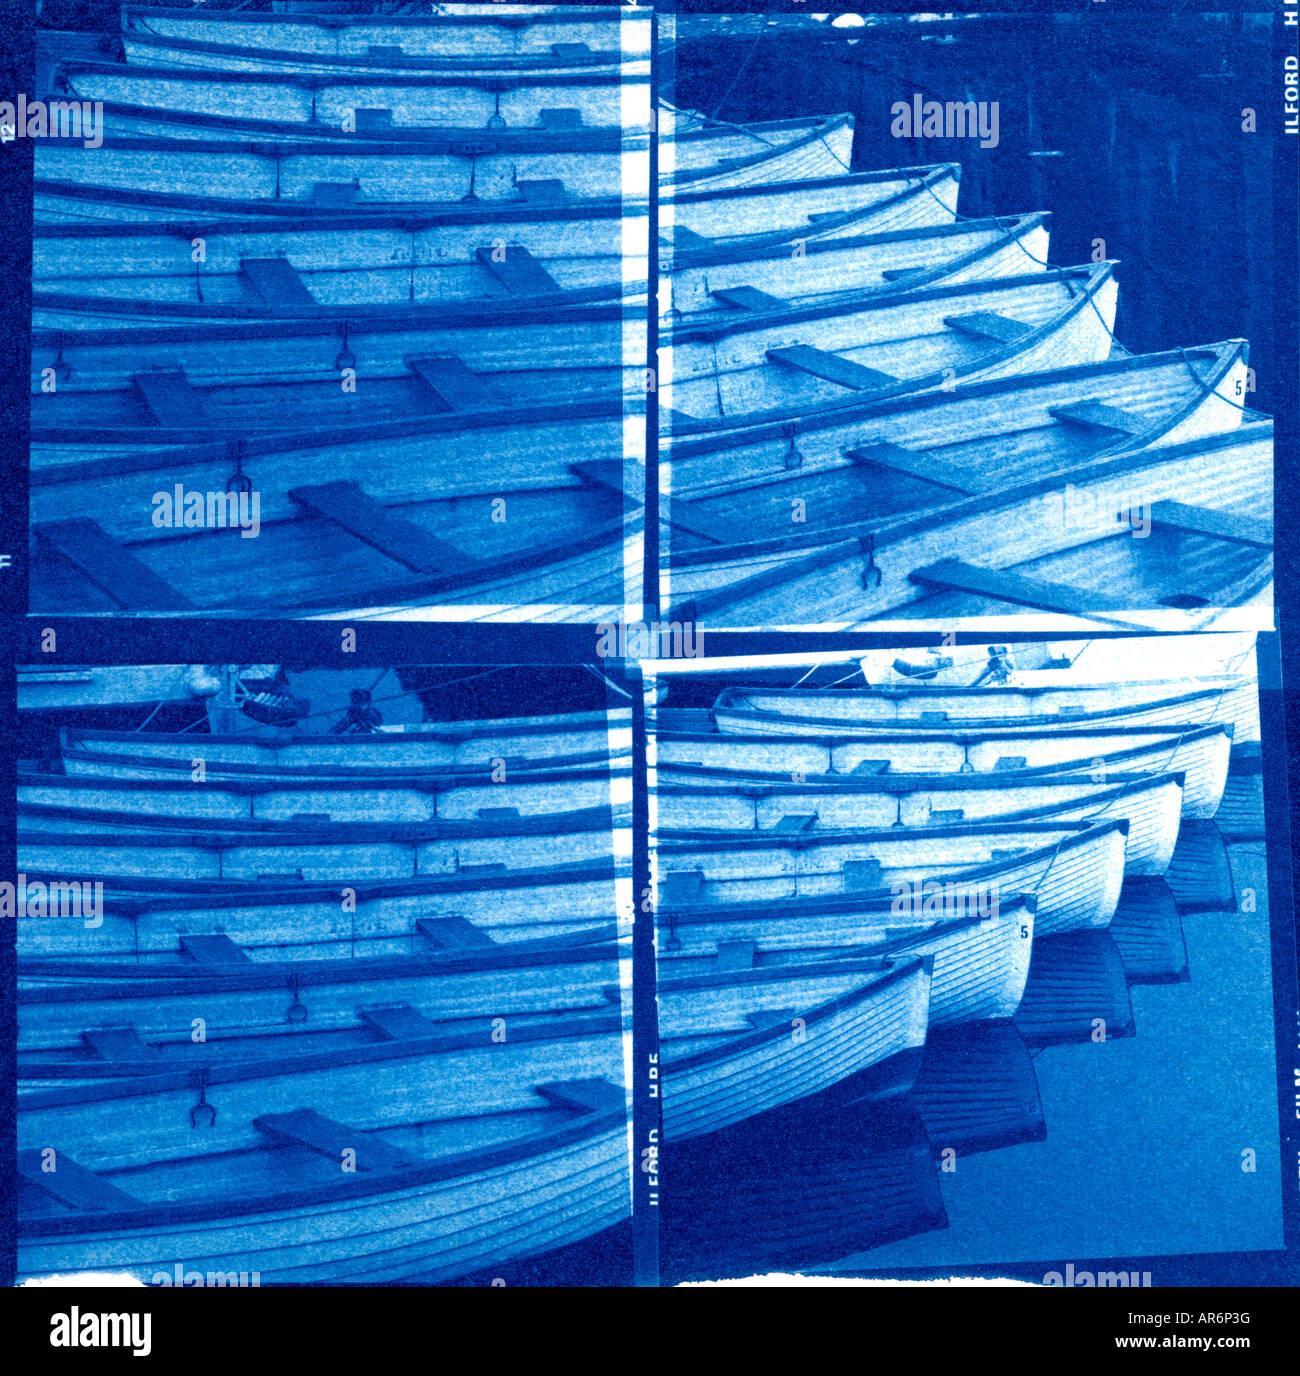 Cyanotype blueprint photographic process rowing boats london cyanotype blueprint photographic process rowing boats london docks uk malvernweather Gallery